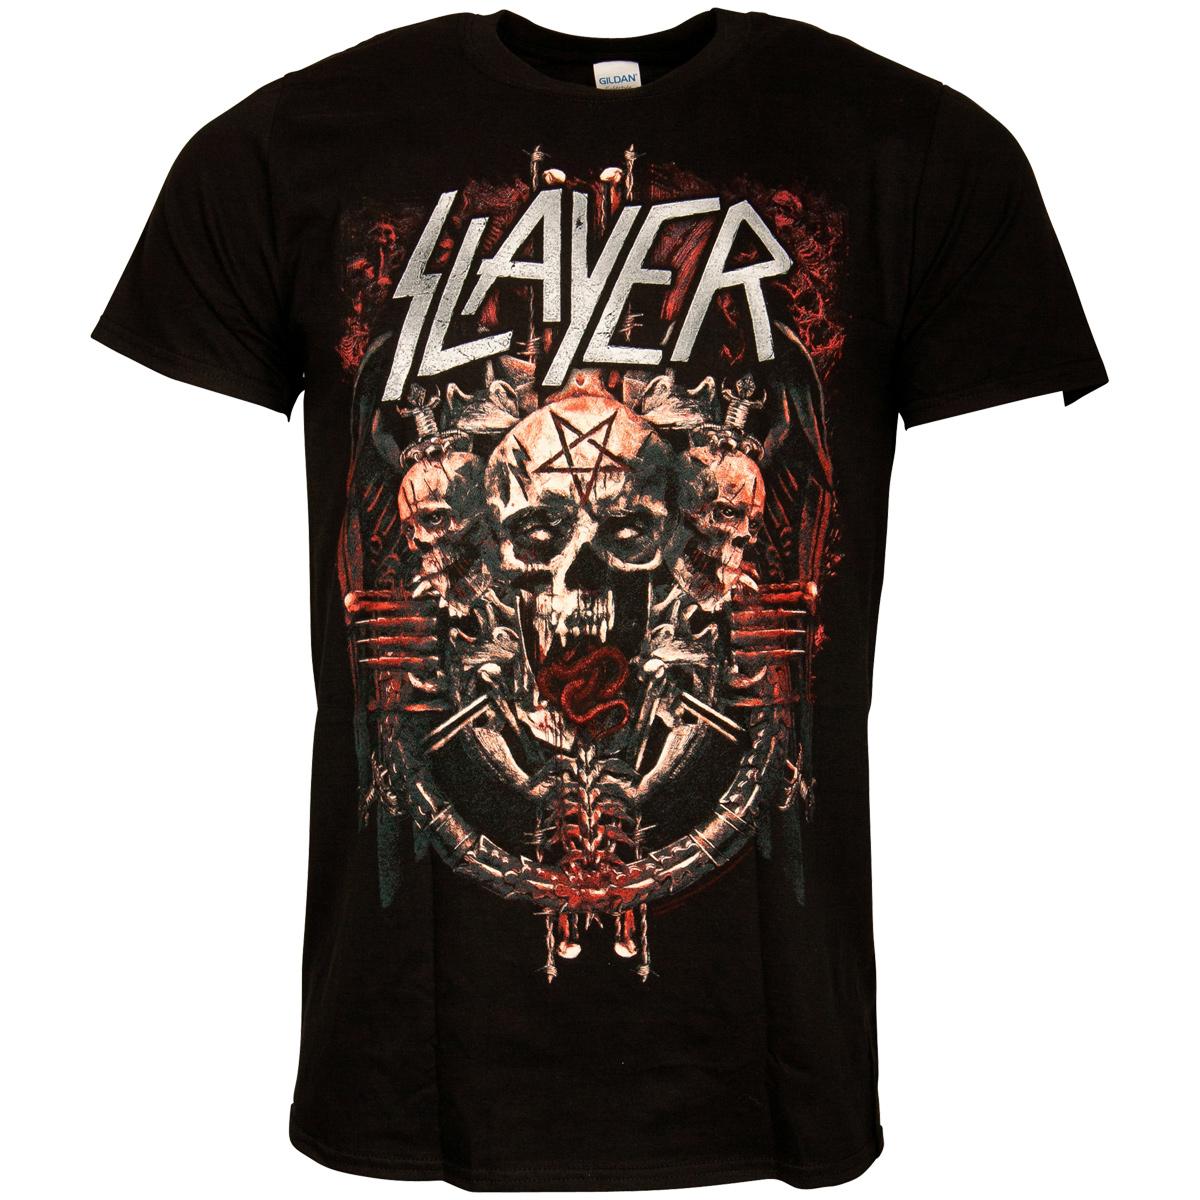 Slayer - T-Shirt Demonic Admat - schwarz